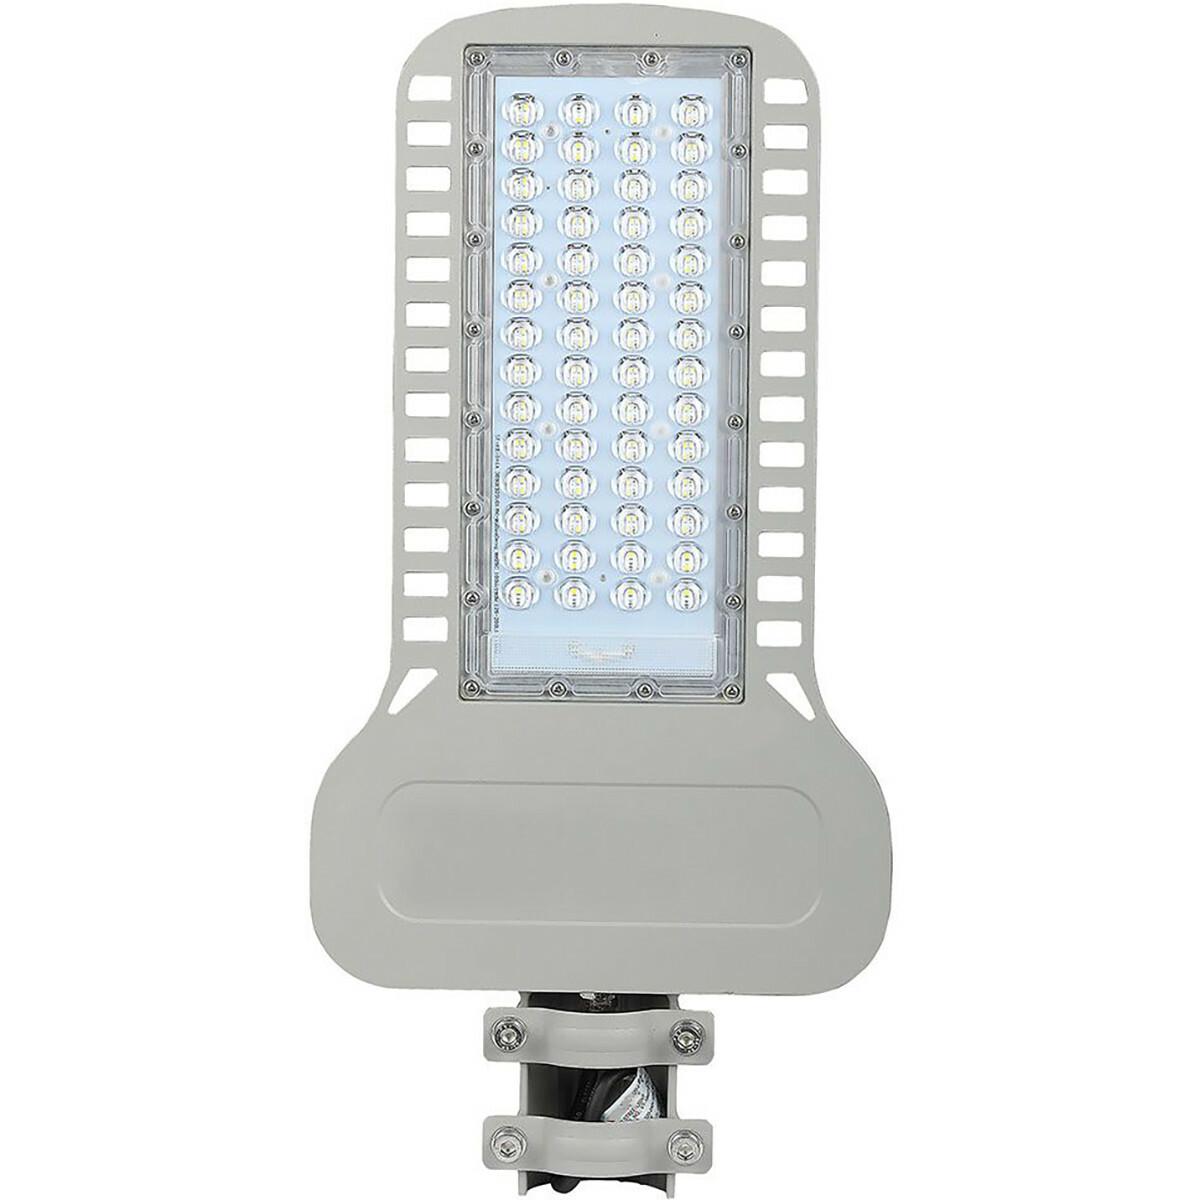 SAMSUNG - LED Straatlamp Slim - Viron Unato - 100W - Natuurlijk Wit 4000K - Waterdicht IP65 - Mat Gr